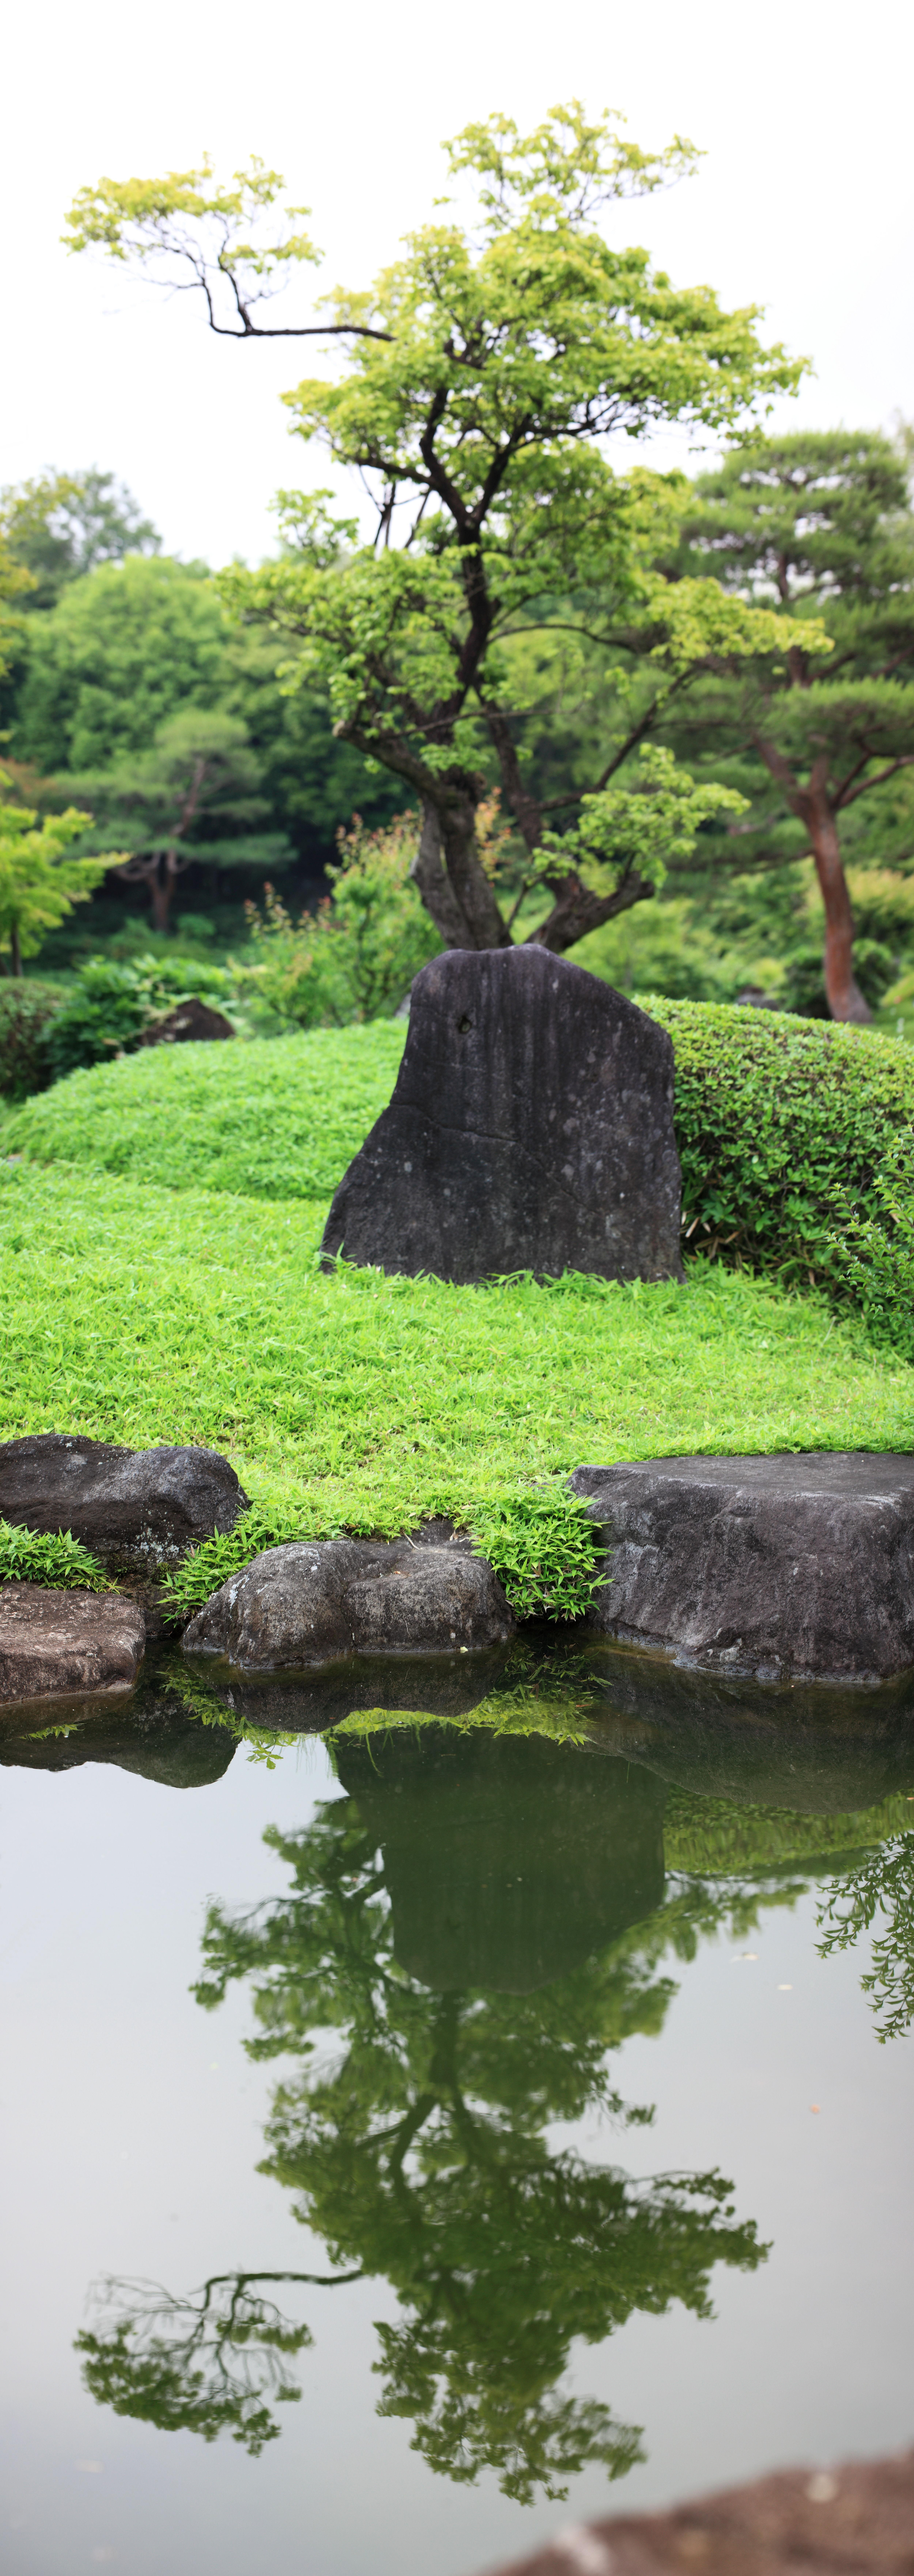 Images gratuites arbre plante panorama tang for Plante jungle